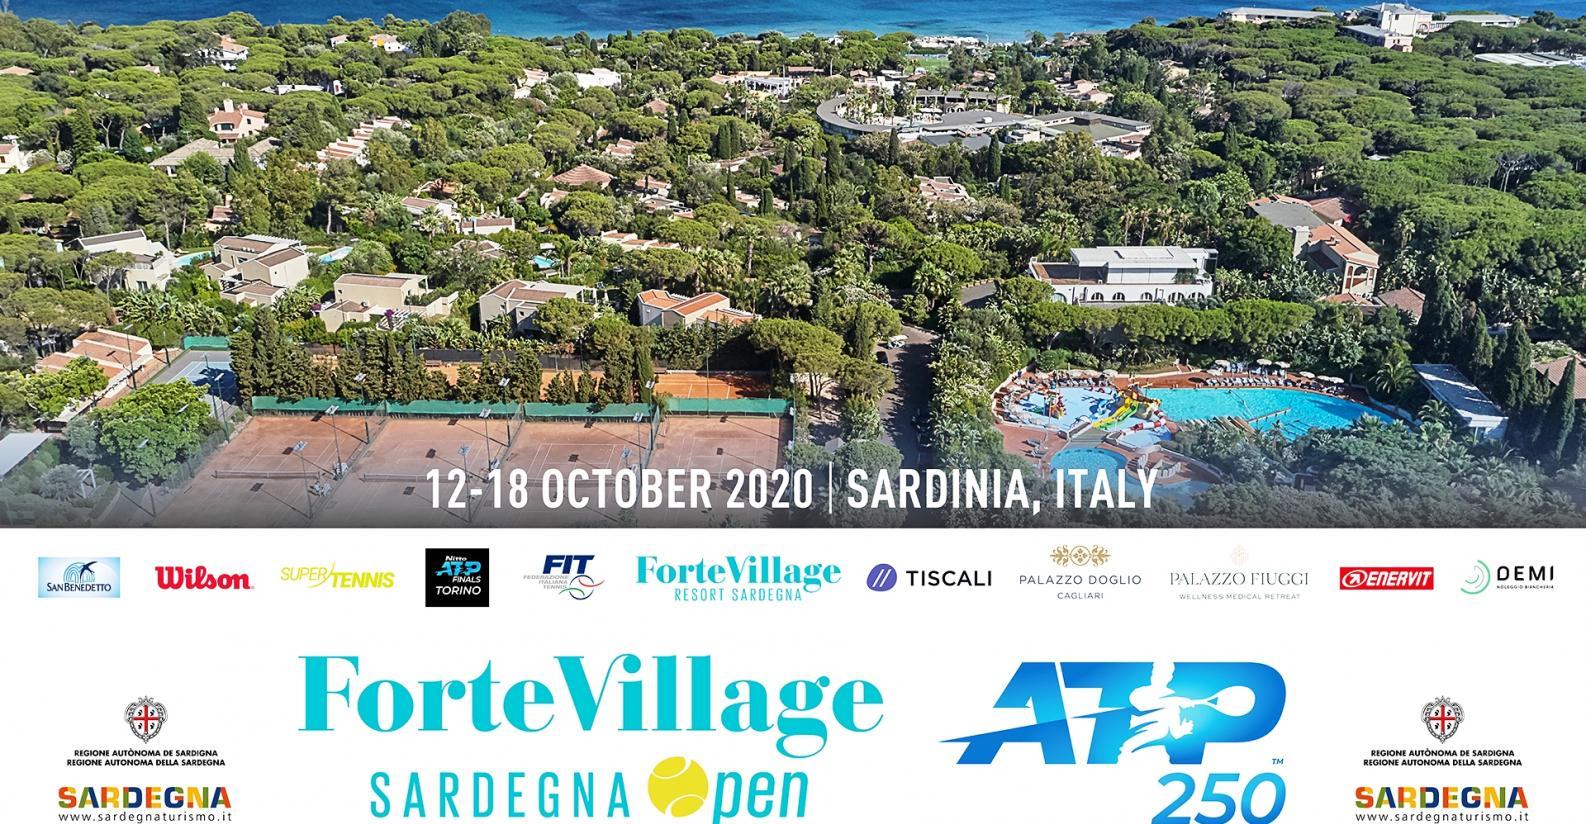 forte_village_sardegna_open